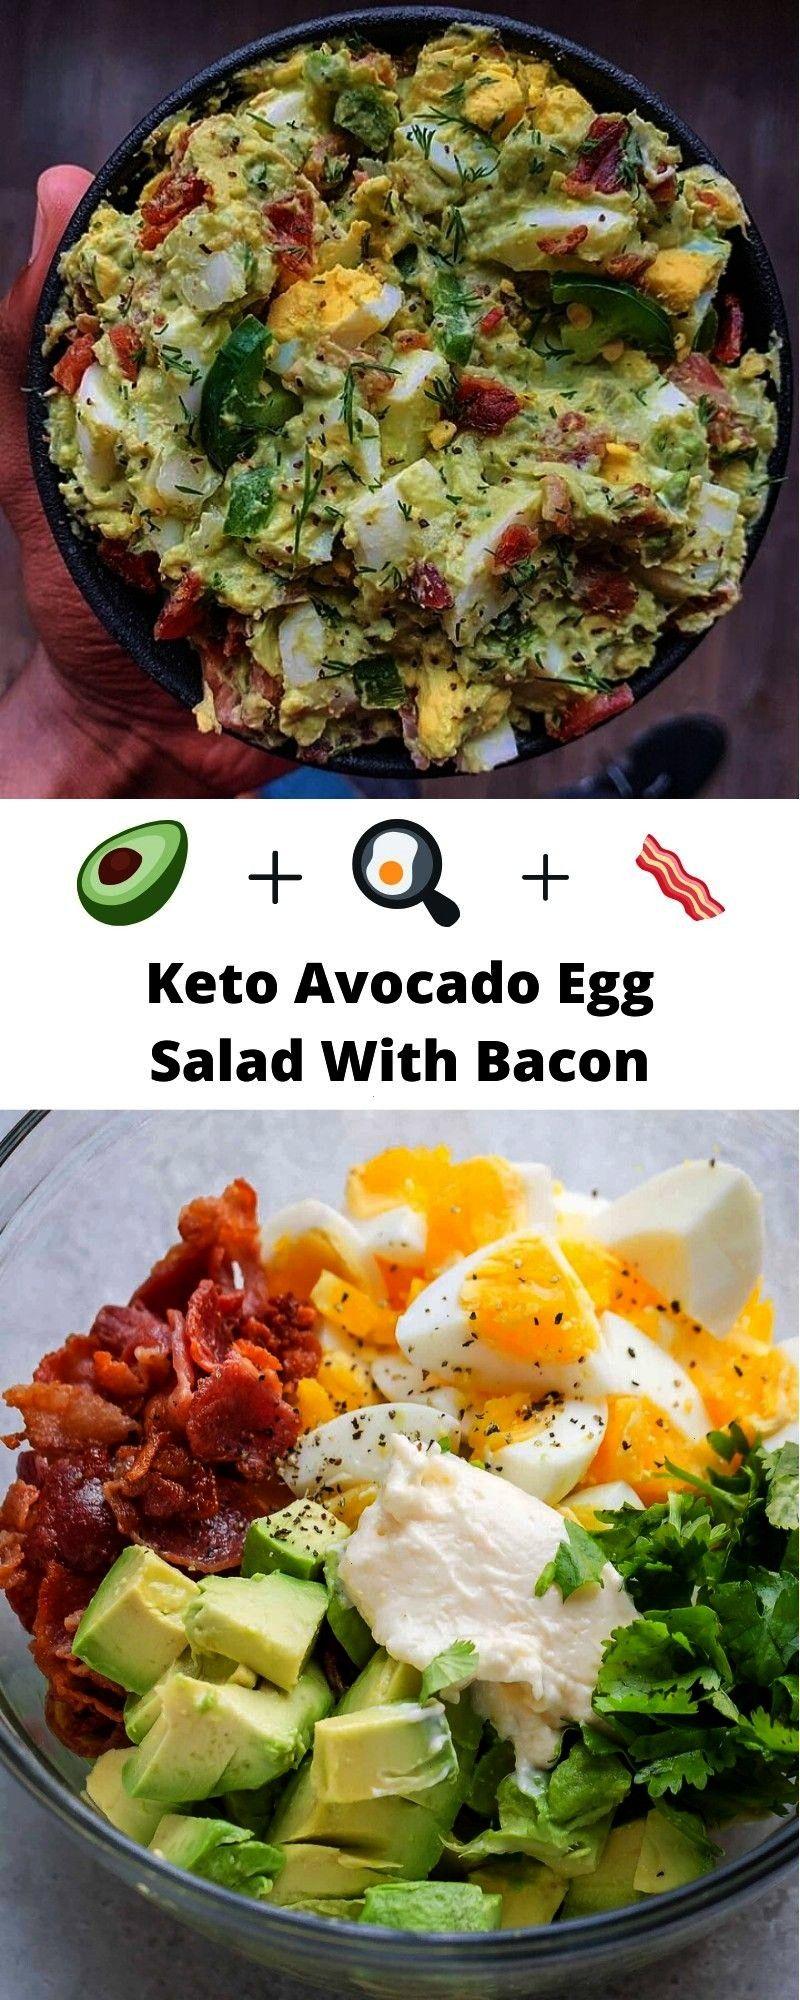 Egg Salad -   -Keto Avocado Egg Salad -   -  Keto Blueberry Cheesecake -  Turn zucchini into taco s